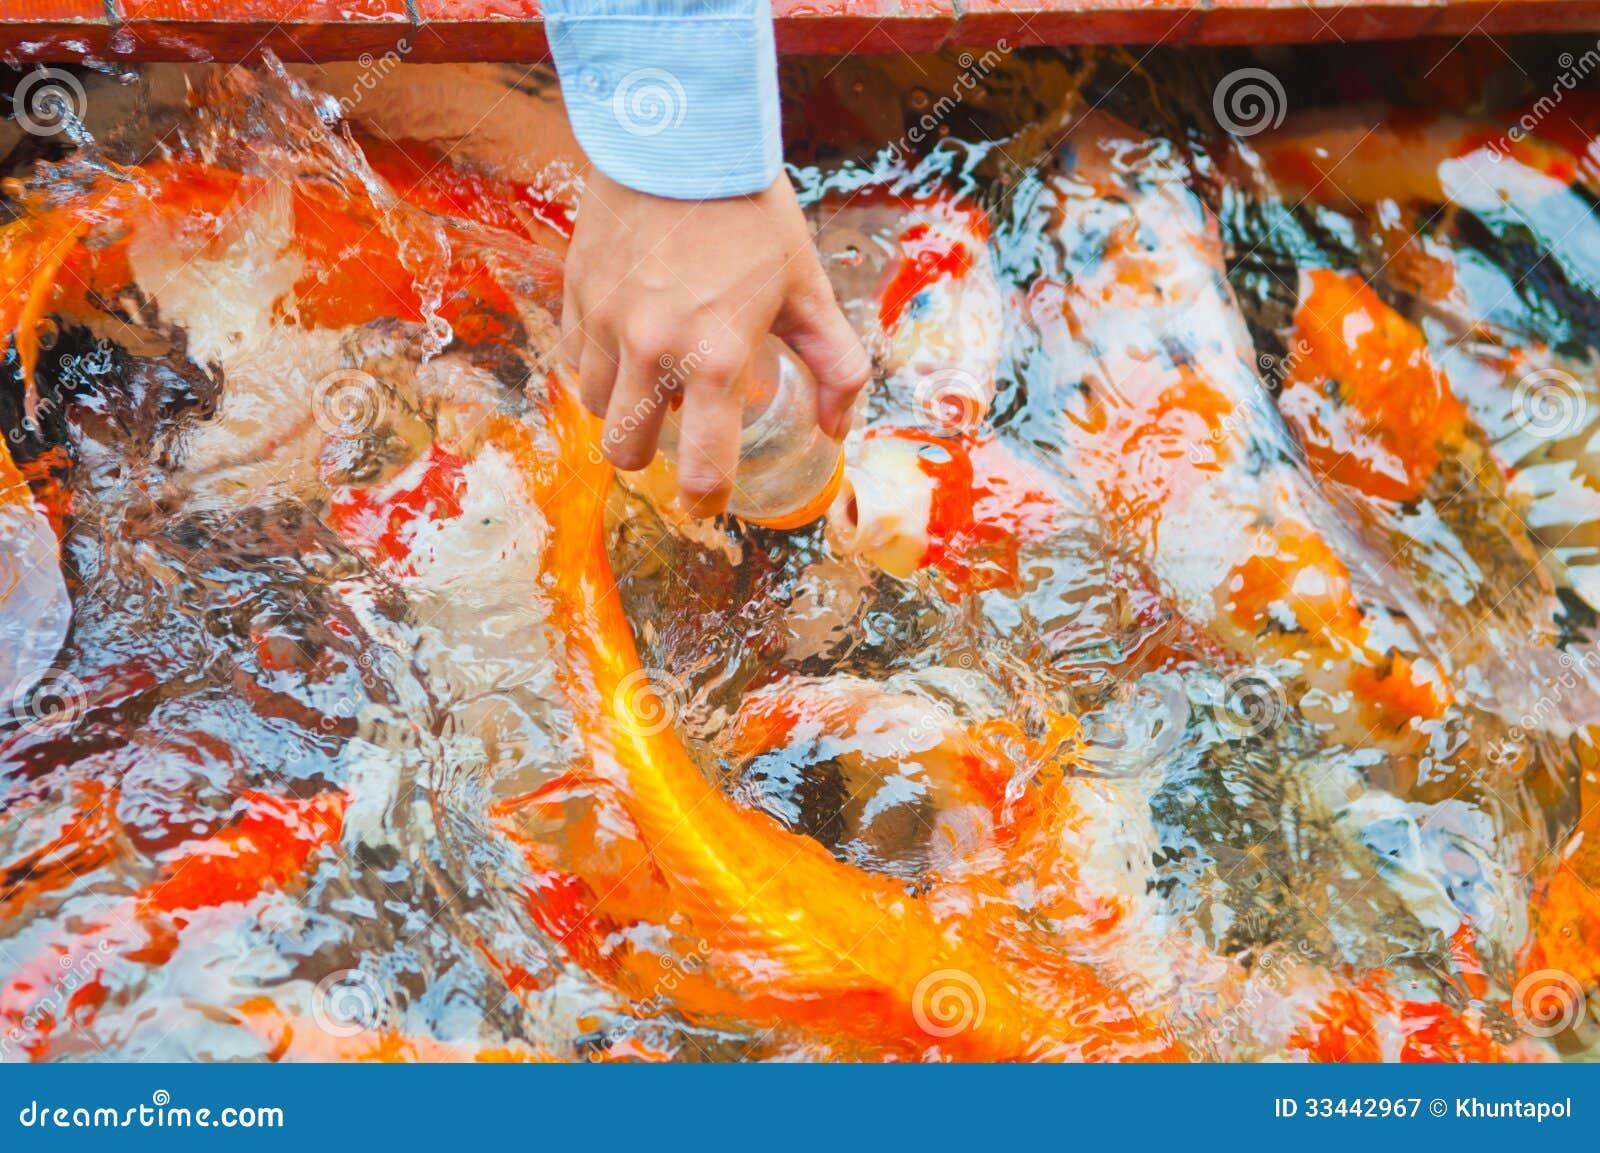 Feeding koi fish with milk bottle royalty free stock for What to feed baby koi